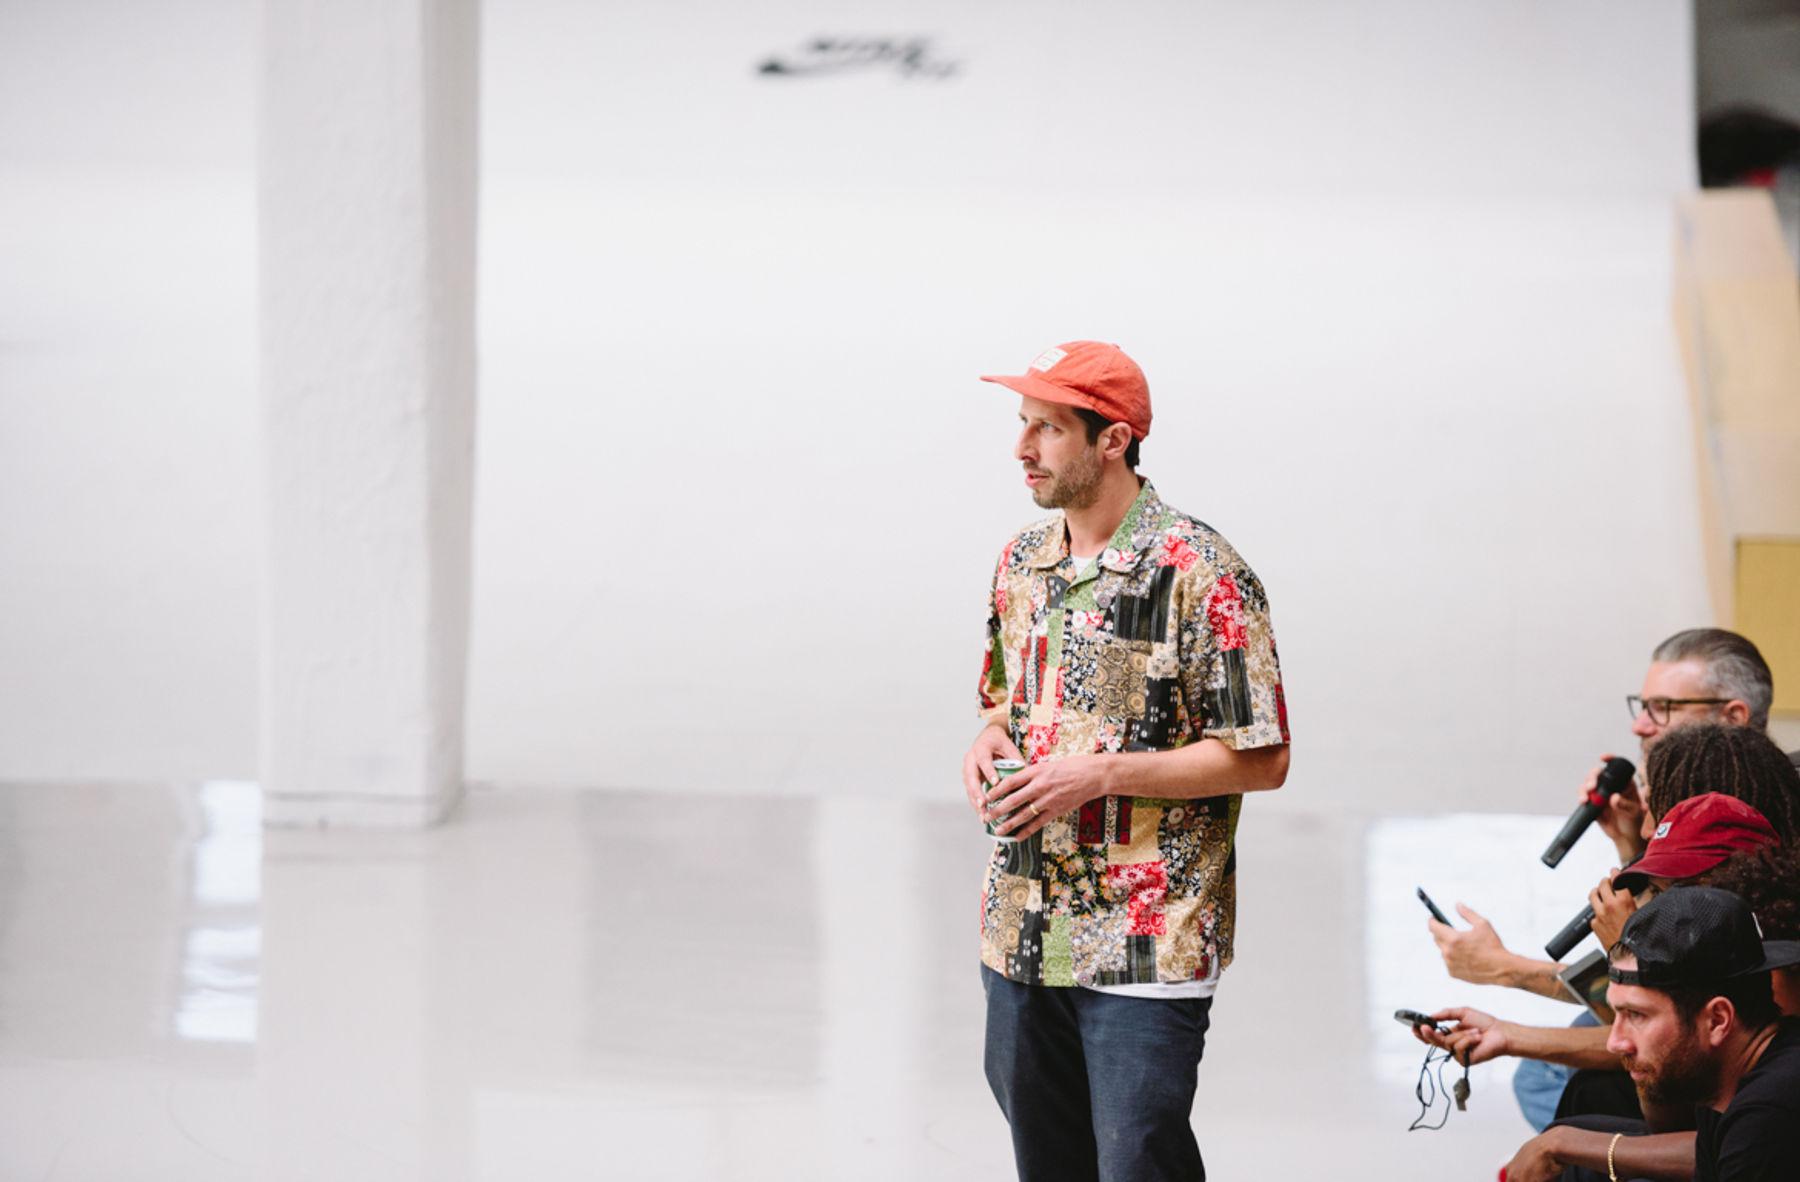 _IHC4671e-Stefan-Janoski-Nike-SB-Copenhagen-Open-Day-3-July-2015-Photographer-Maksim-Kalanep